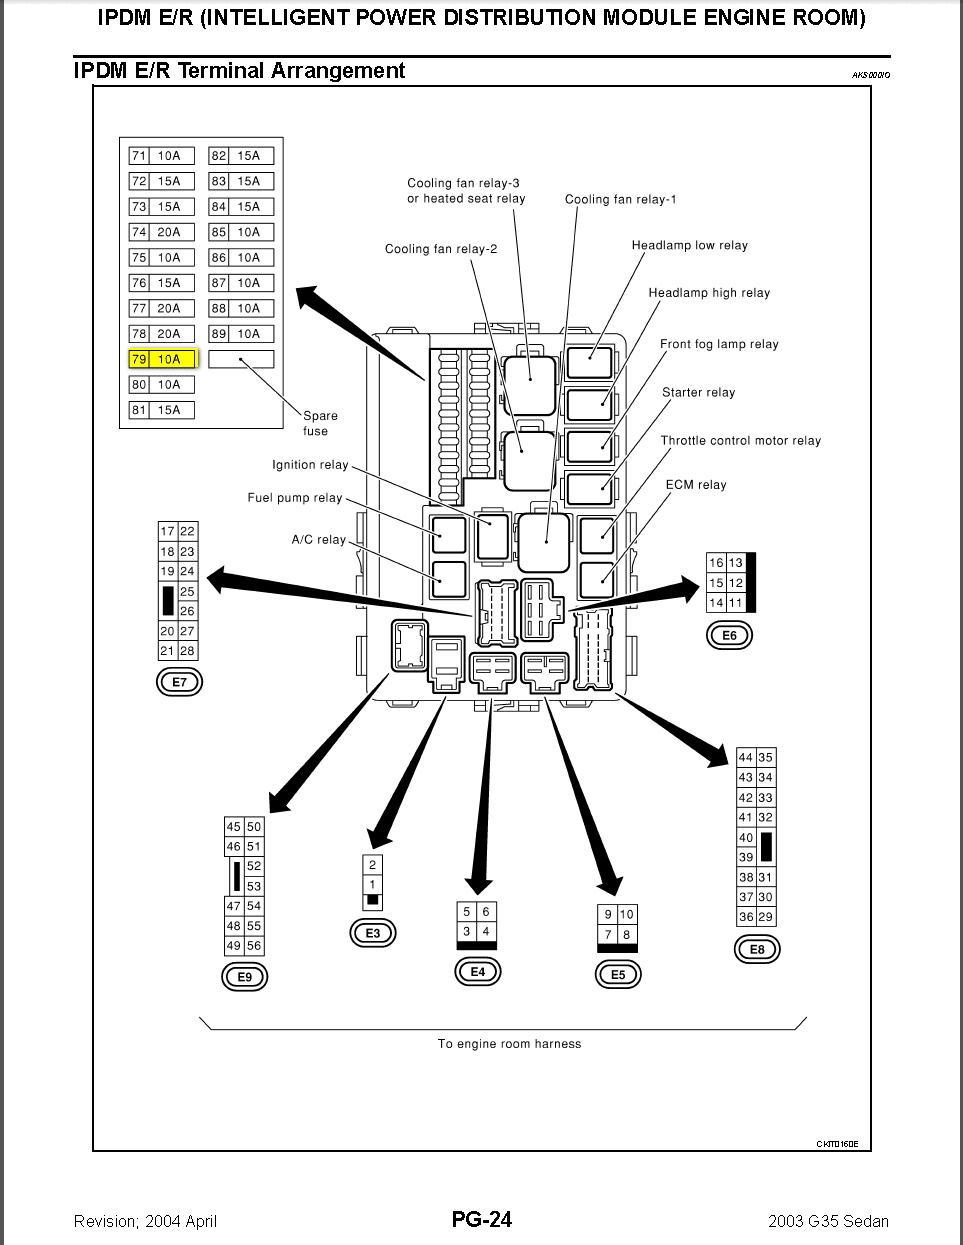 Circuit Electric For Guide: 2007 infiniti g35 fuse diagram